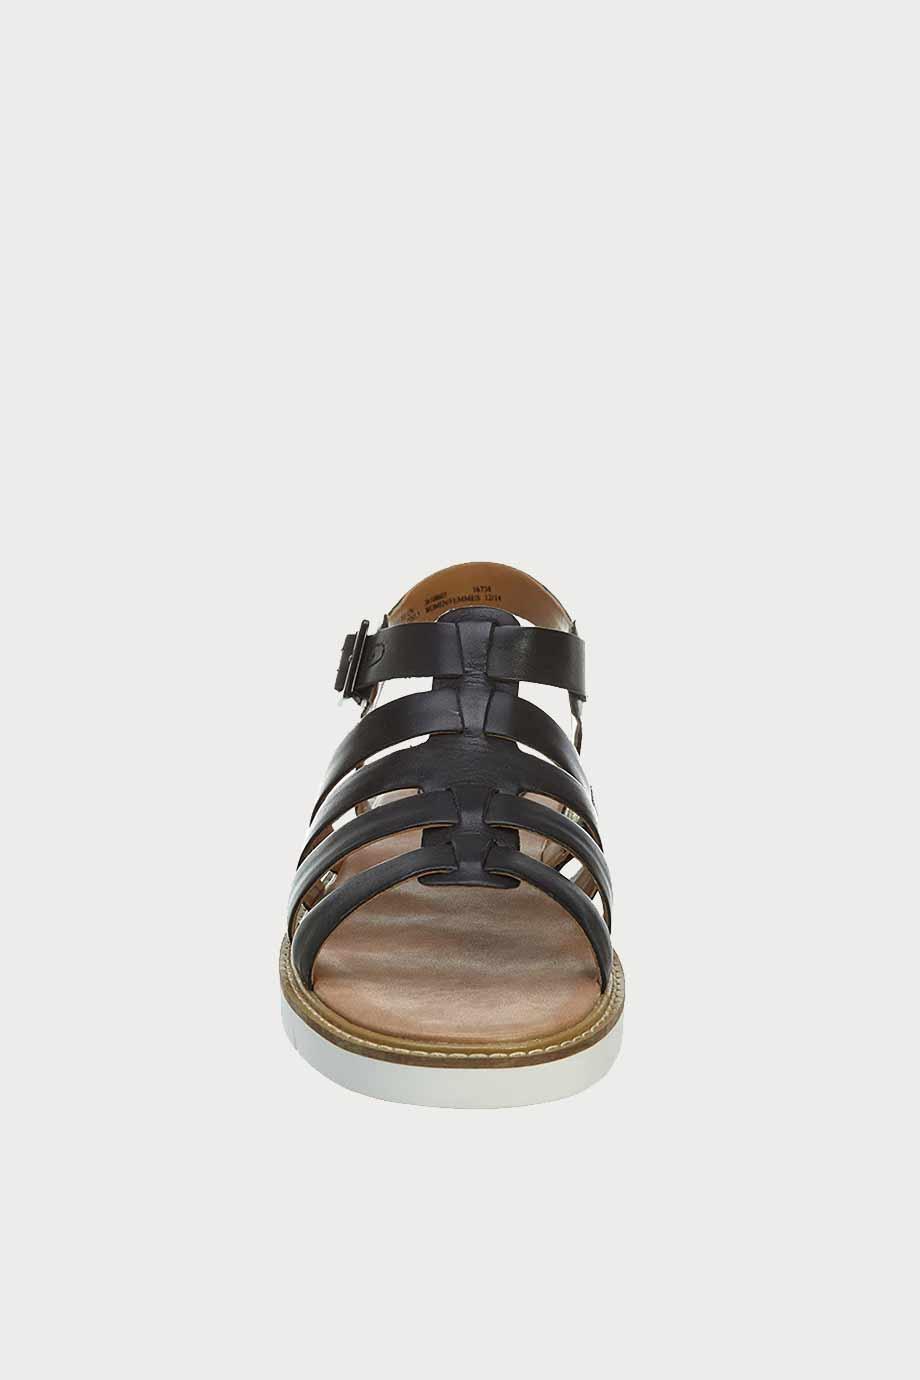 spiridoula metheniti shoes xalkida p Lydie Kona clarks black leather 5